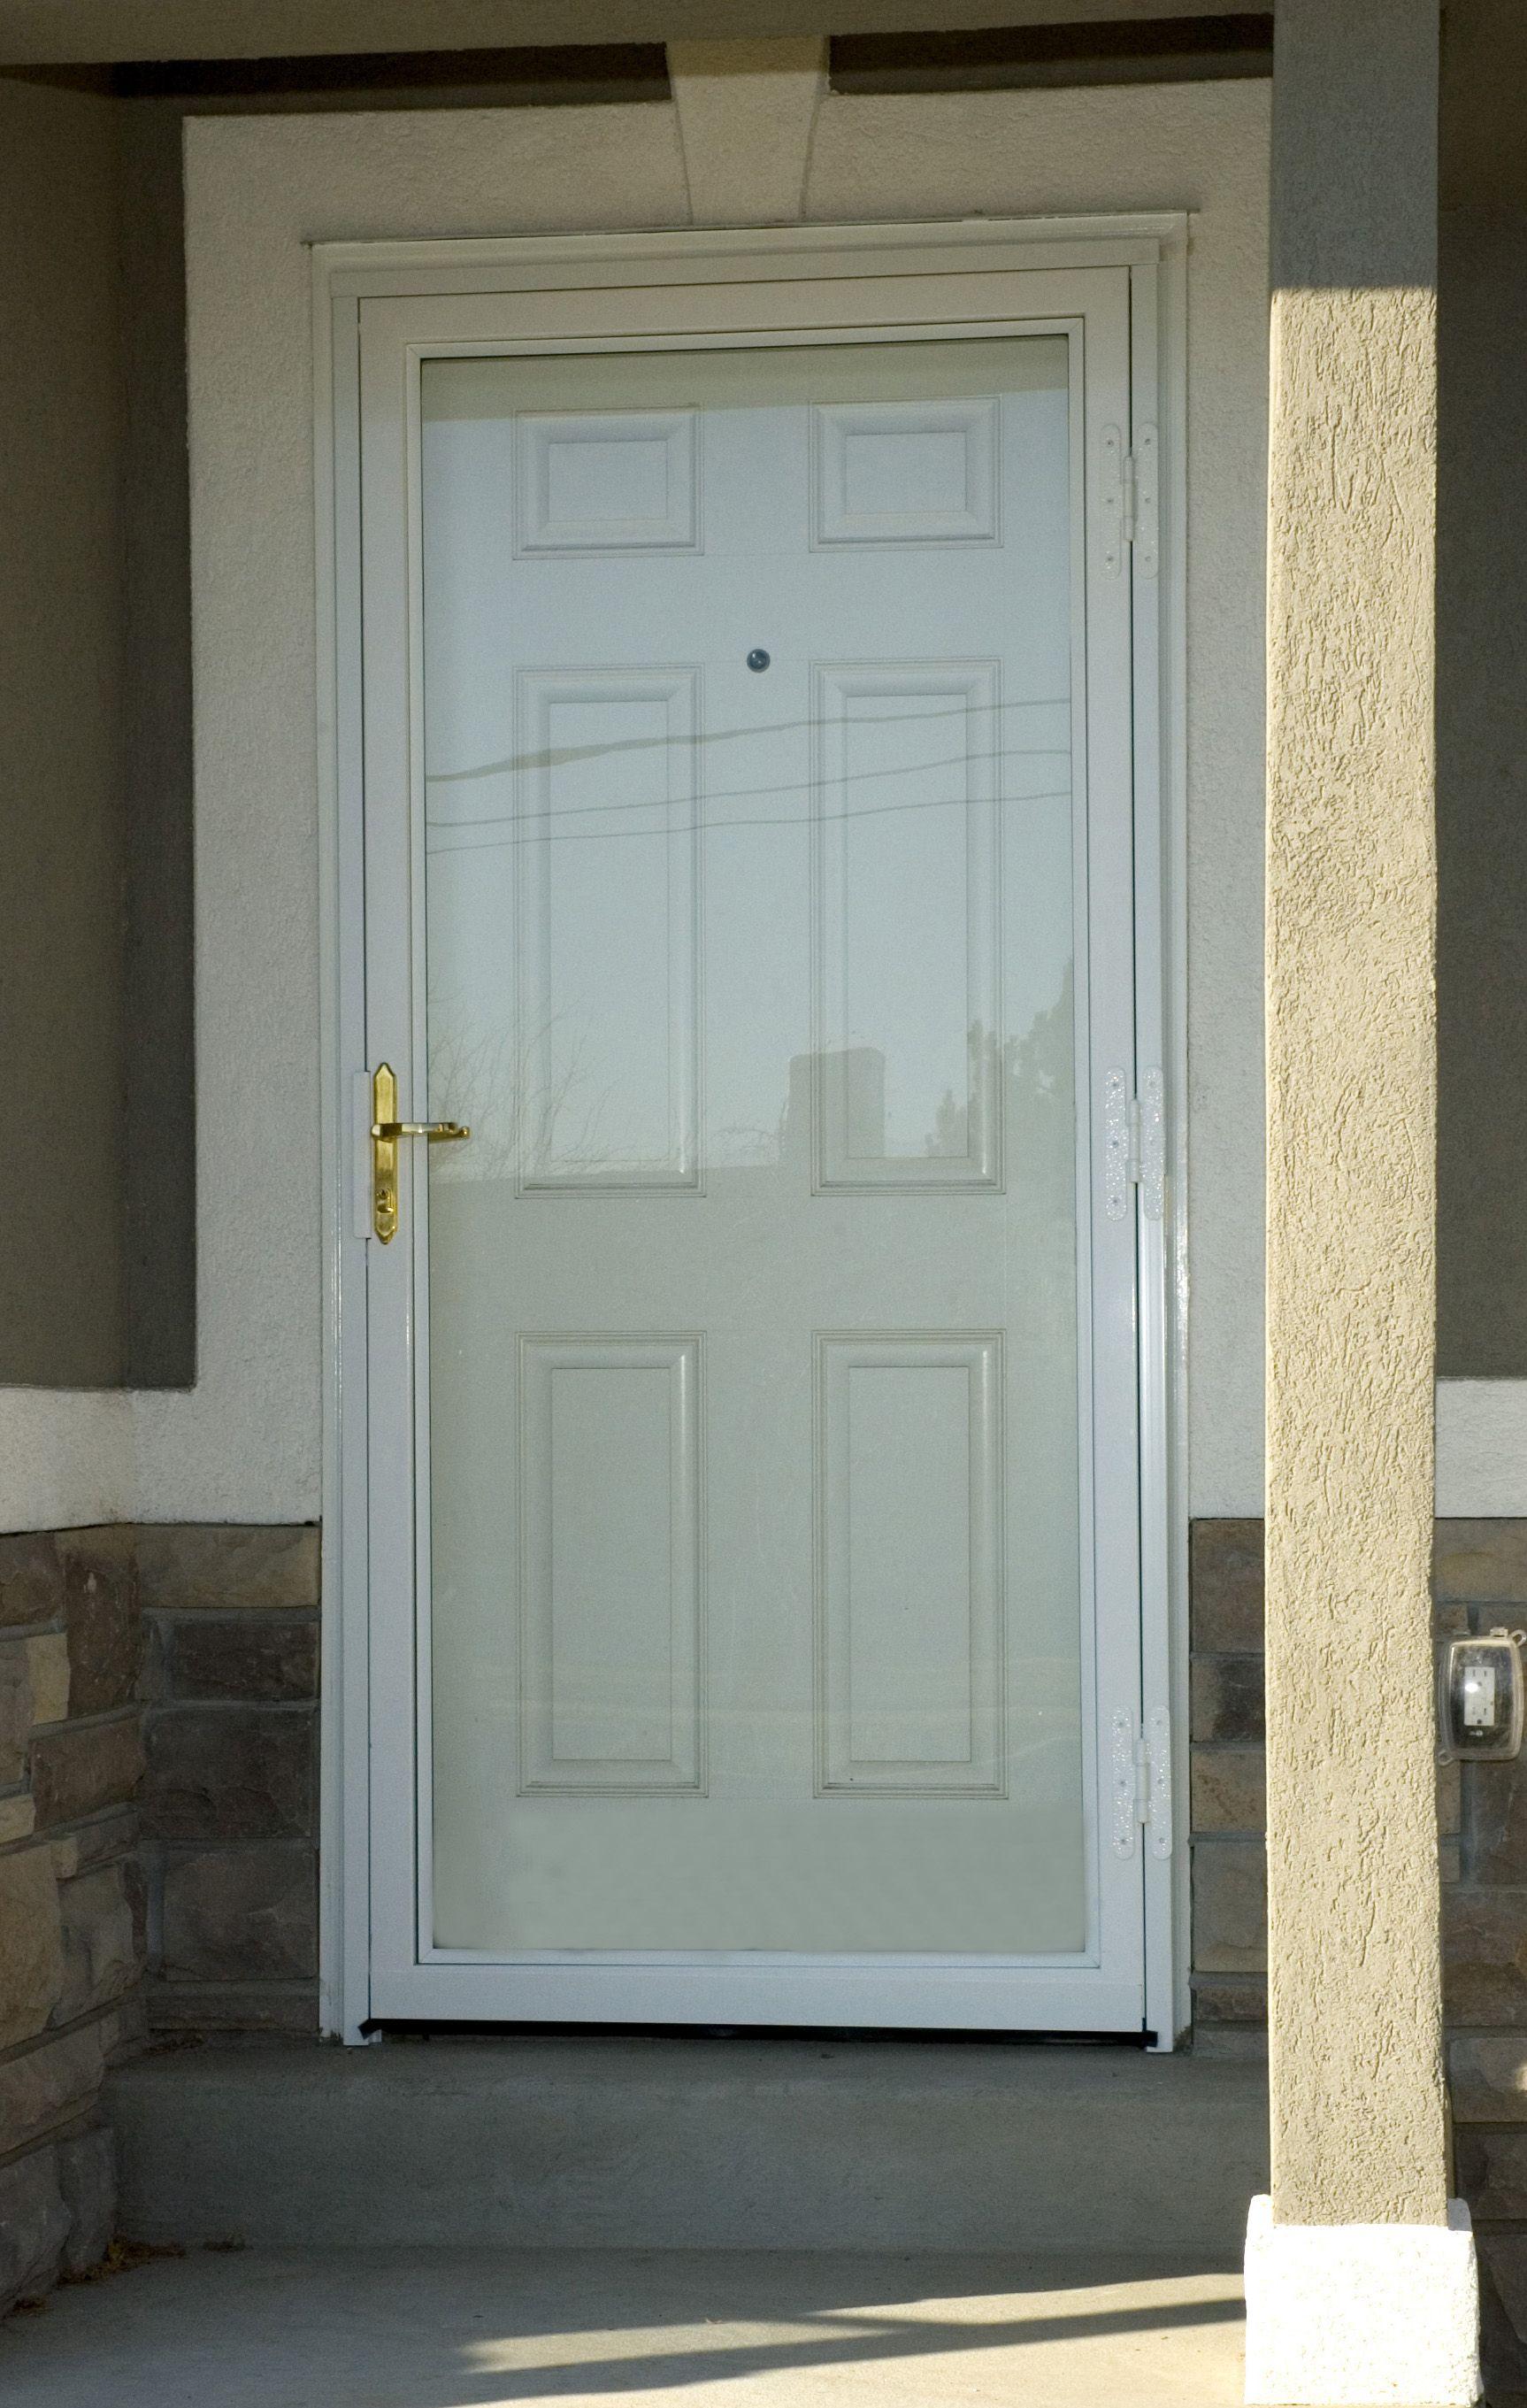 Utah Storm Doors Peach Building Products Windows Doors